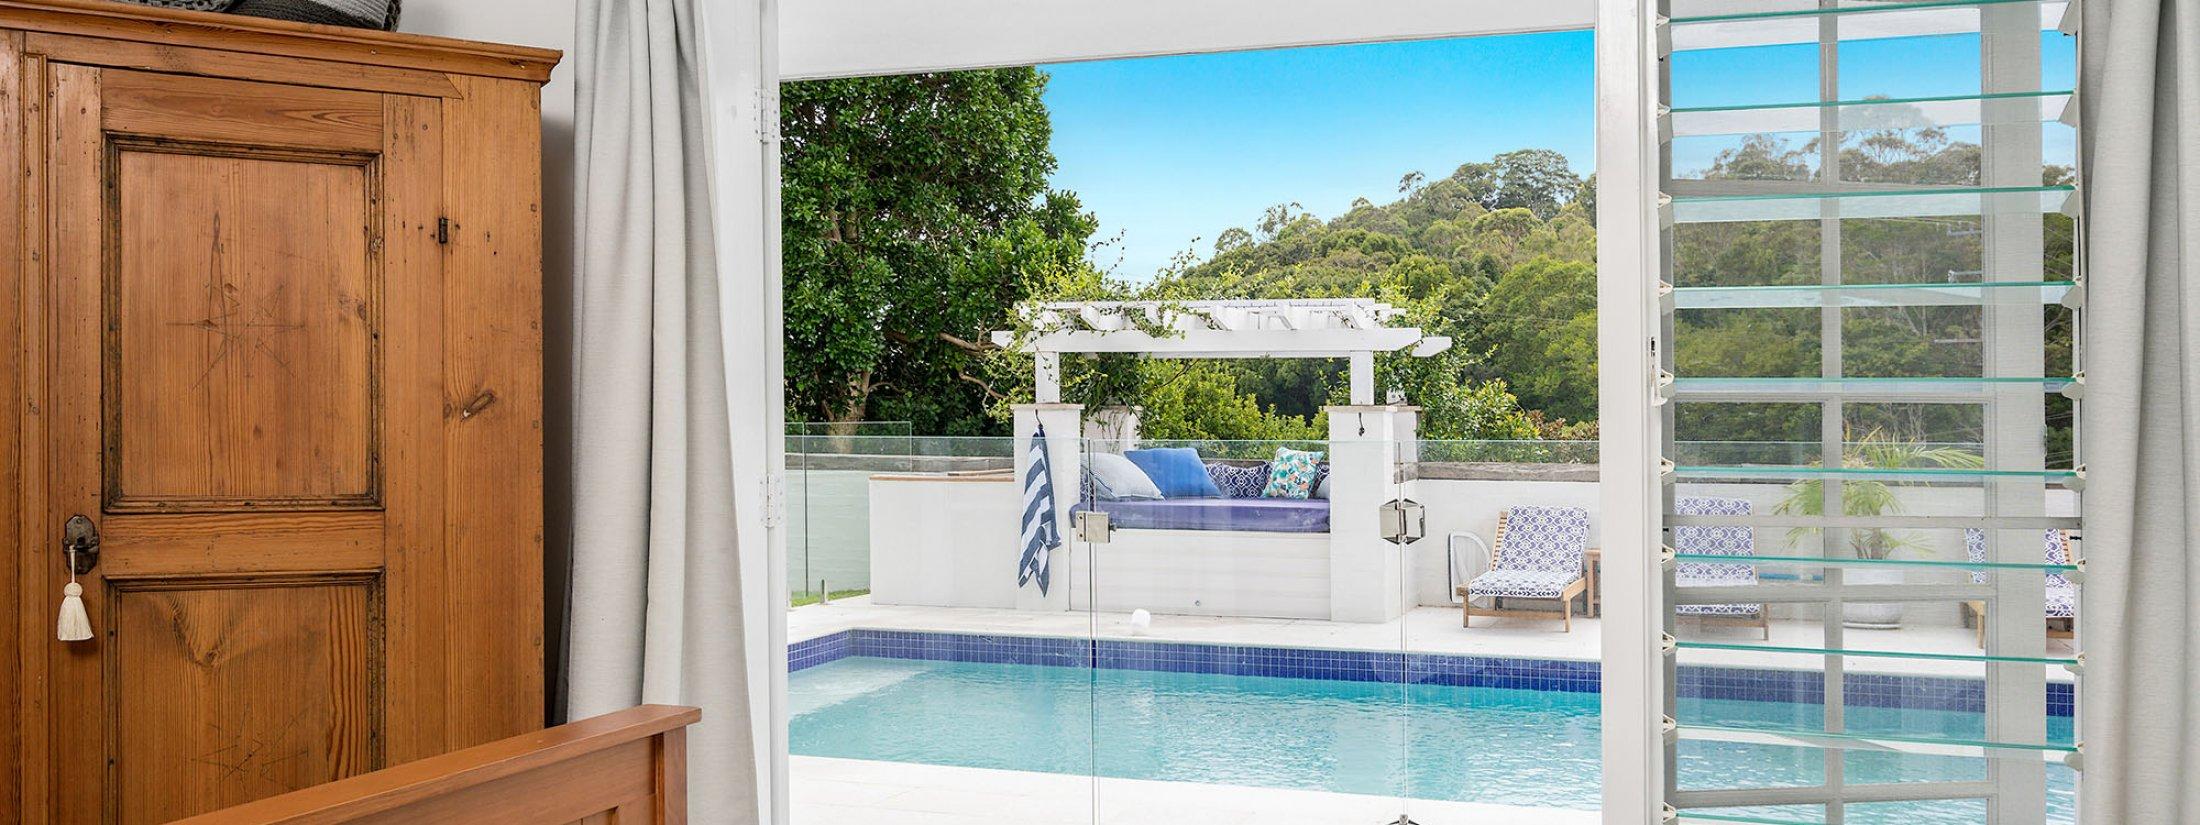 Byron Hills Hinterland Retreat - Byron Bay - Bedroom 2 View to Pool